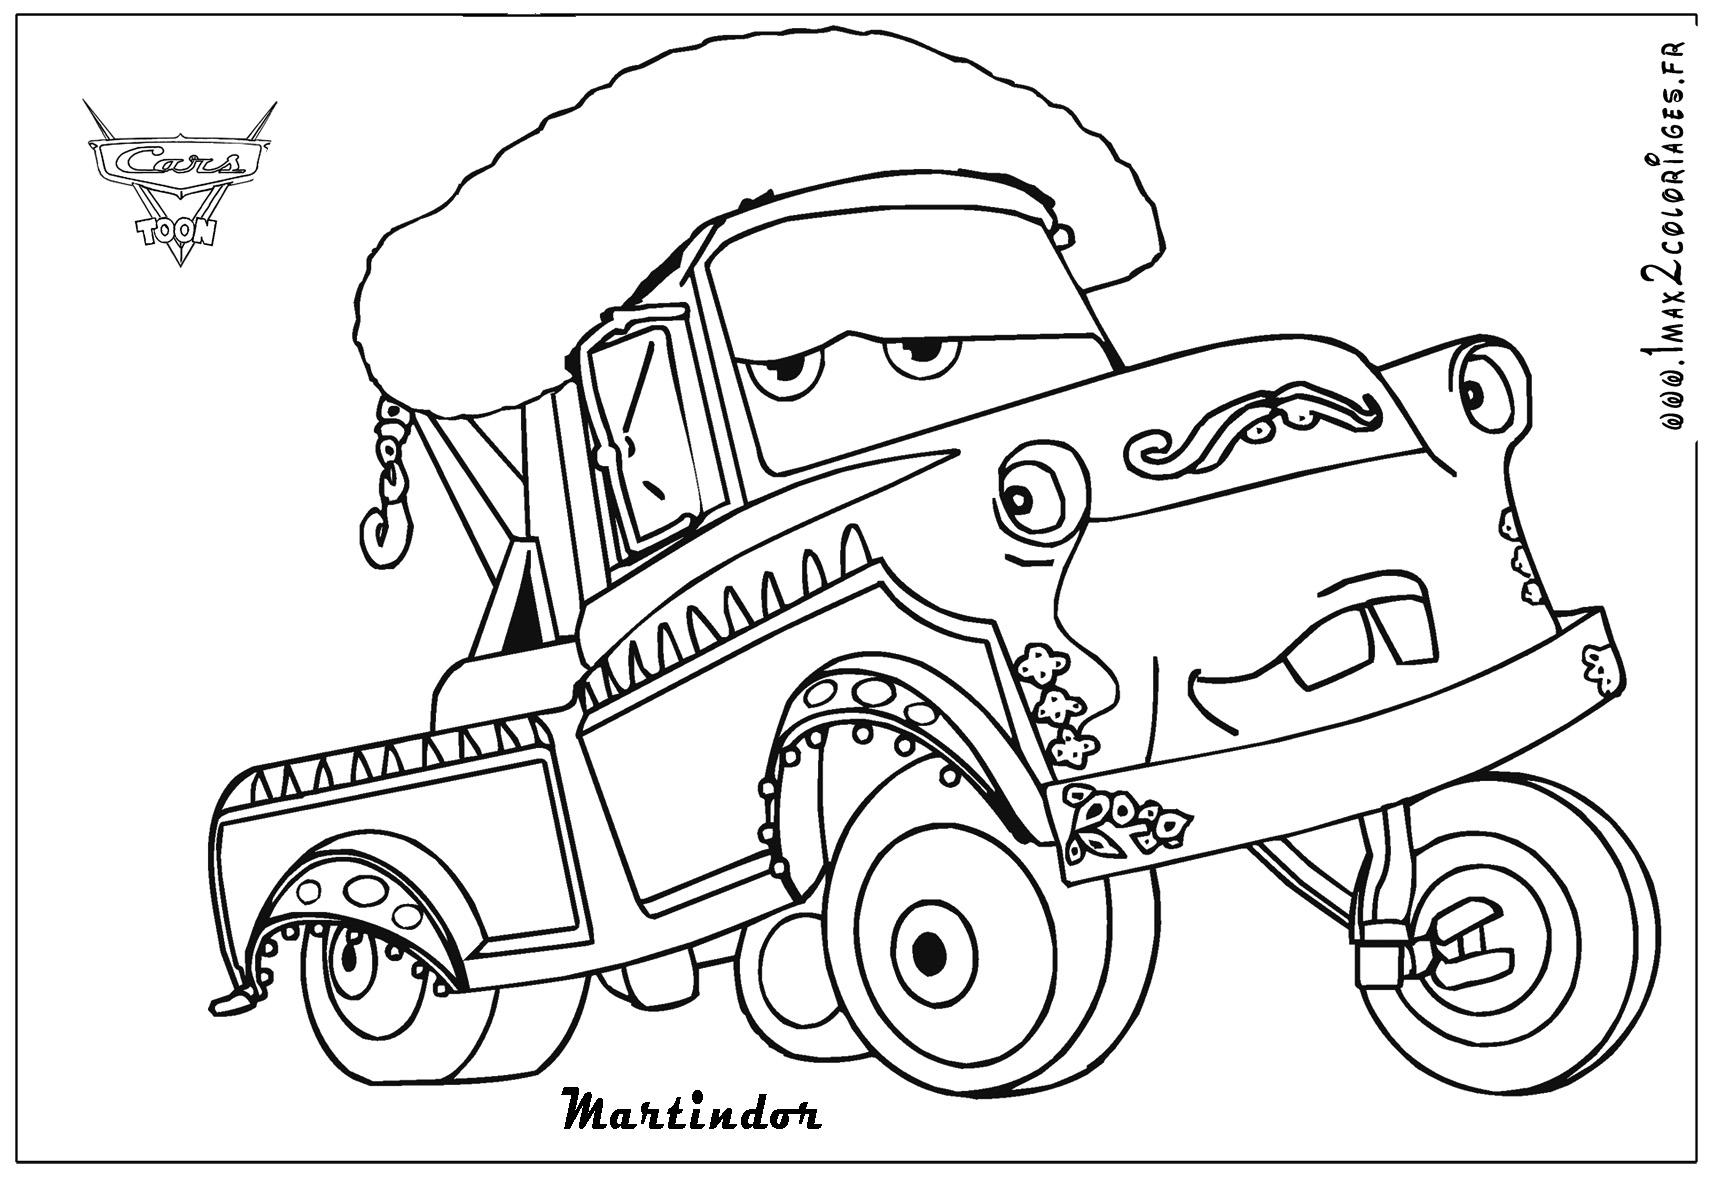 Dessin cars 2 gratuit imprimer - Cars coloriage ...